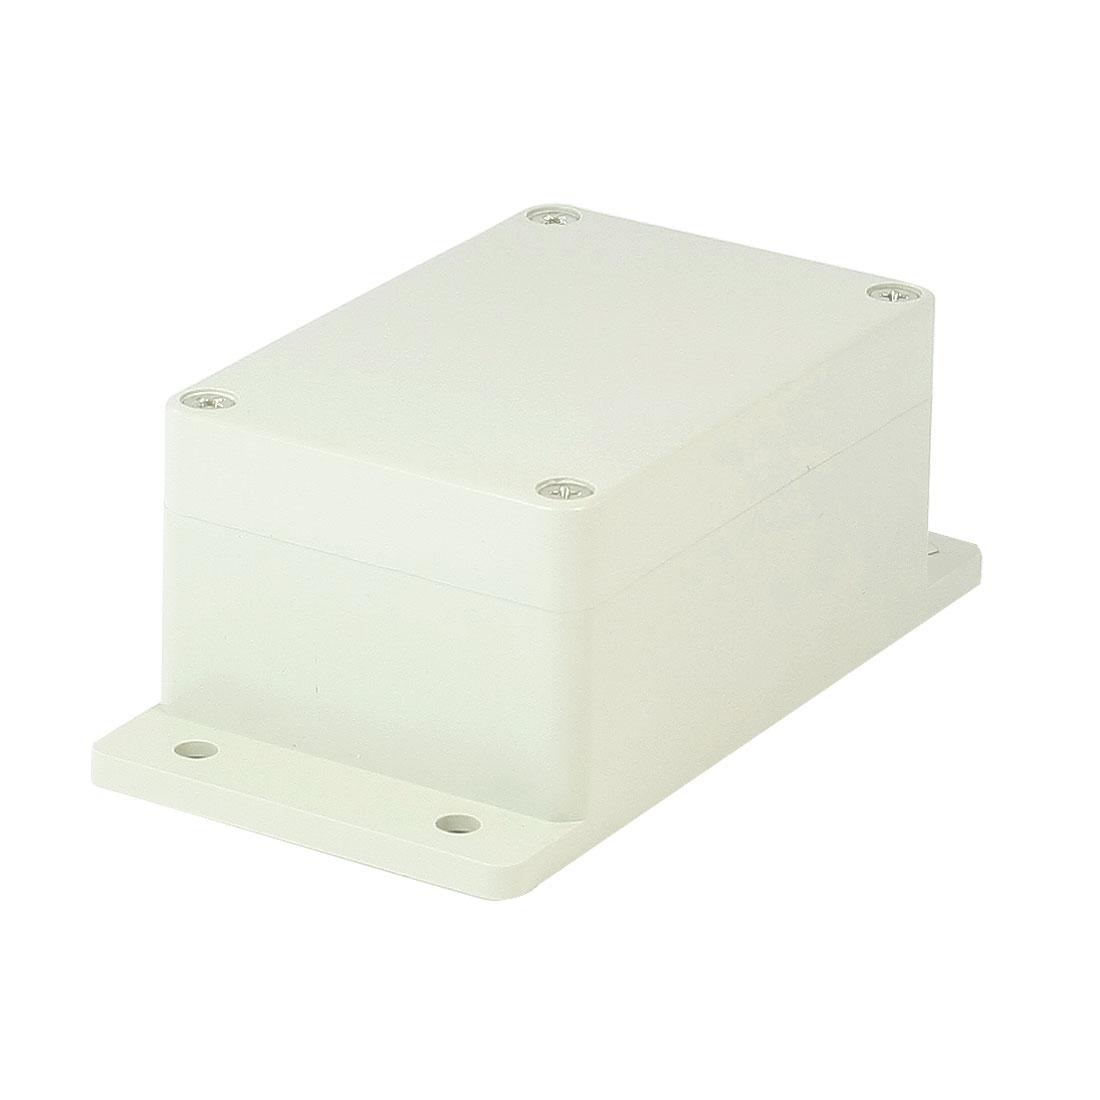 100mm x 68mm x 50mm Waterproof Plastic Enclosure Case DIY Junction Box